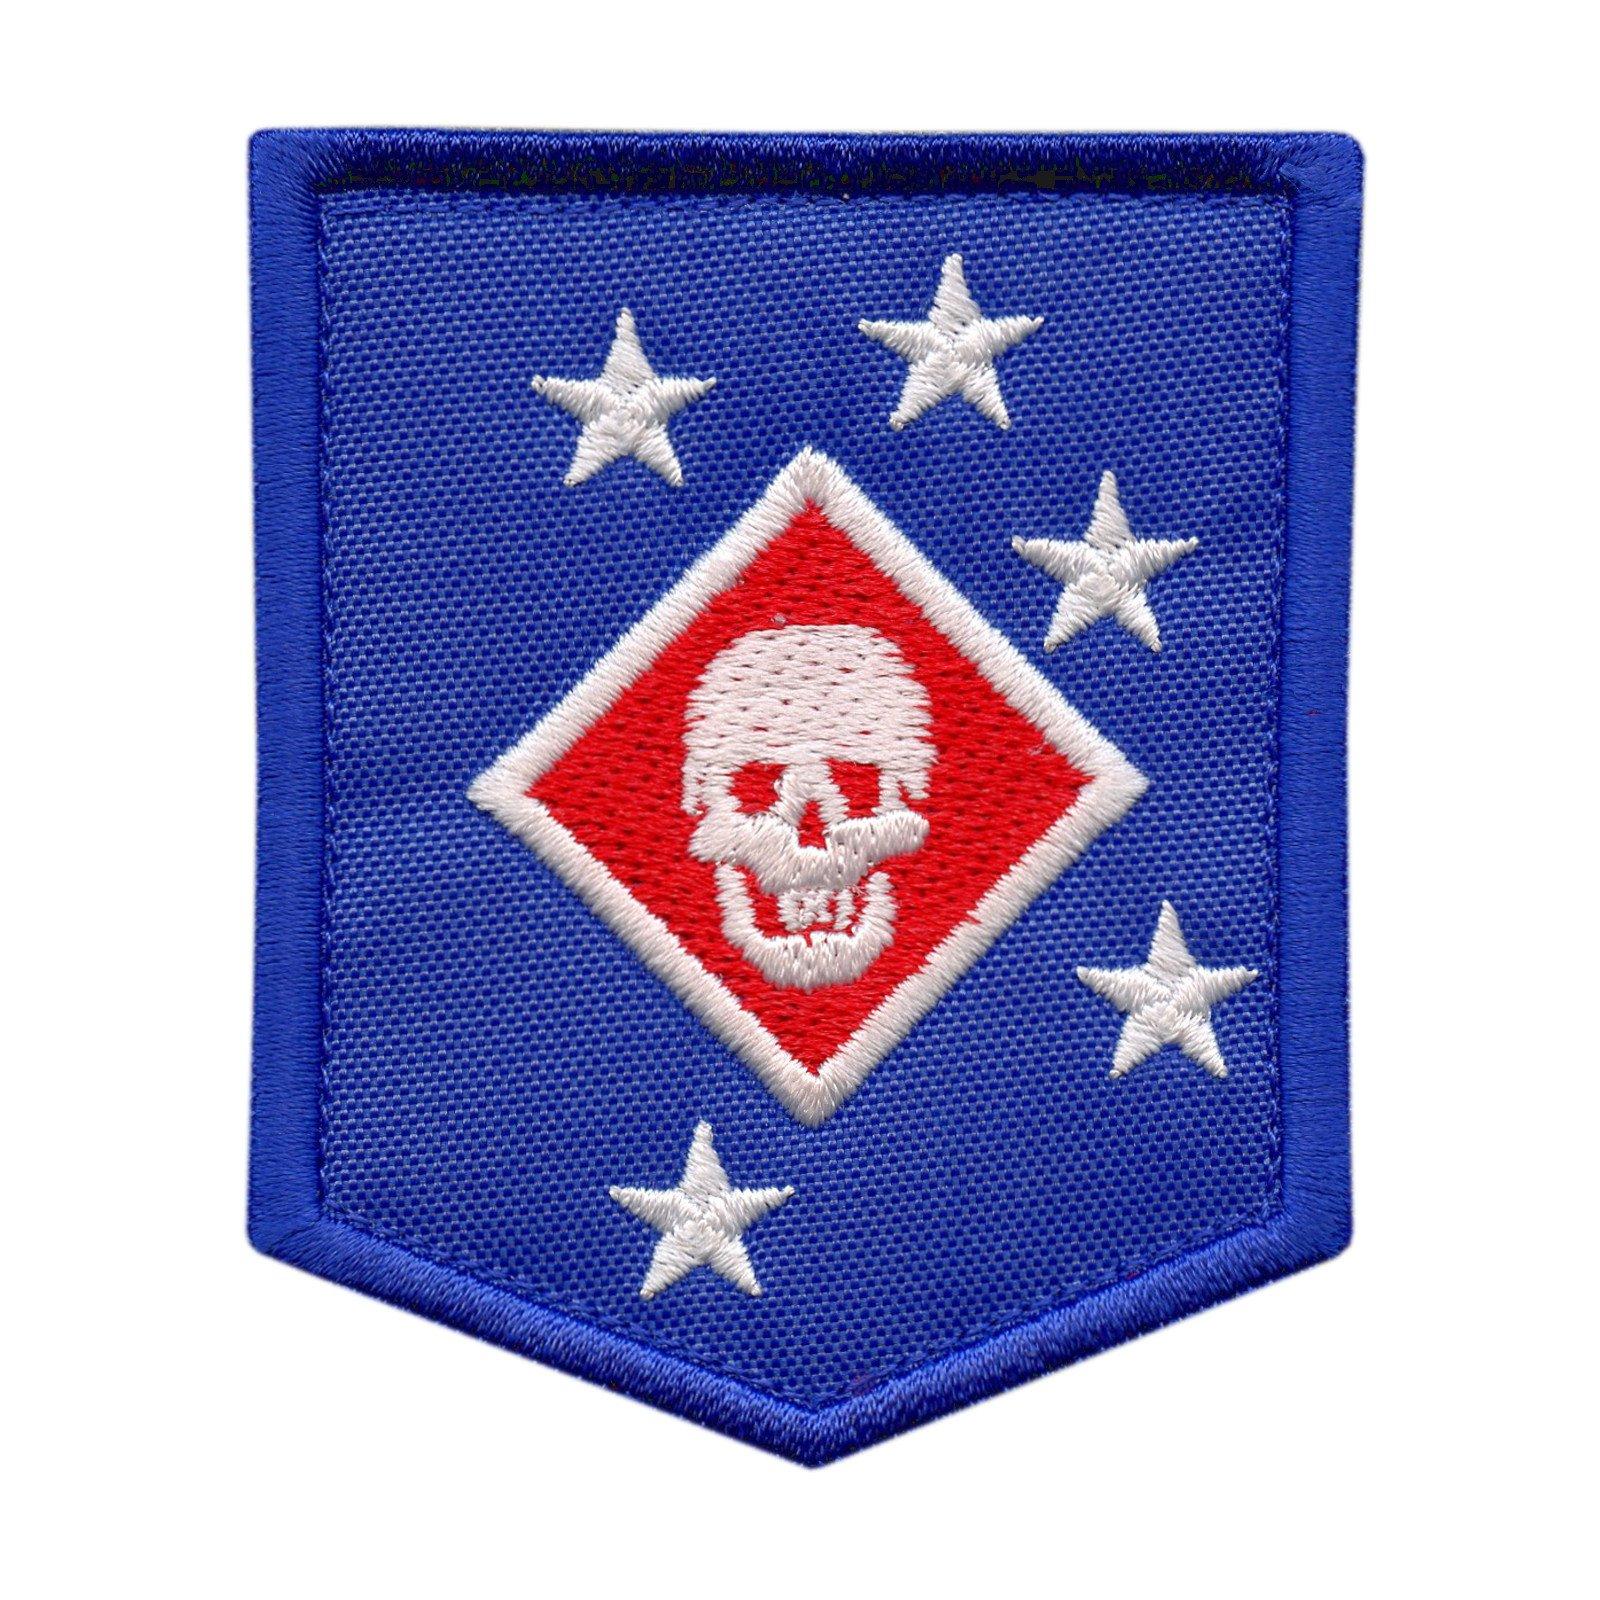 USMC Raiders Marines MARSOC Morale Tactical Ricamata Ricamo Sew Termoadesiva Toppa Patch